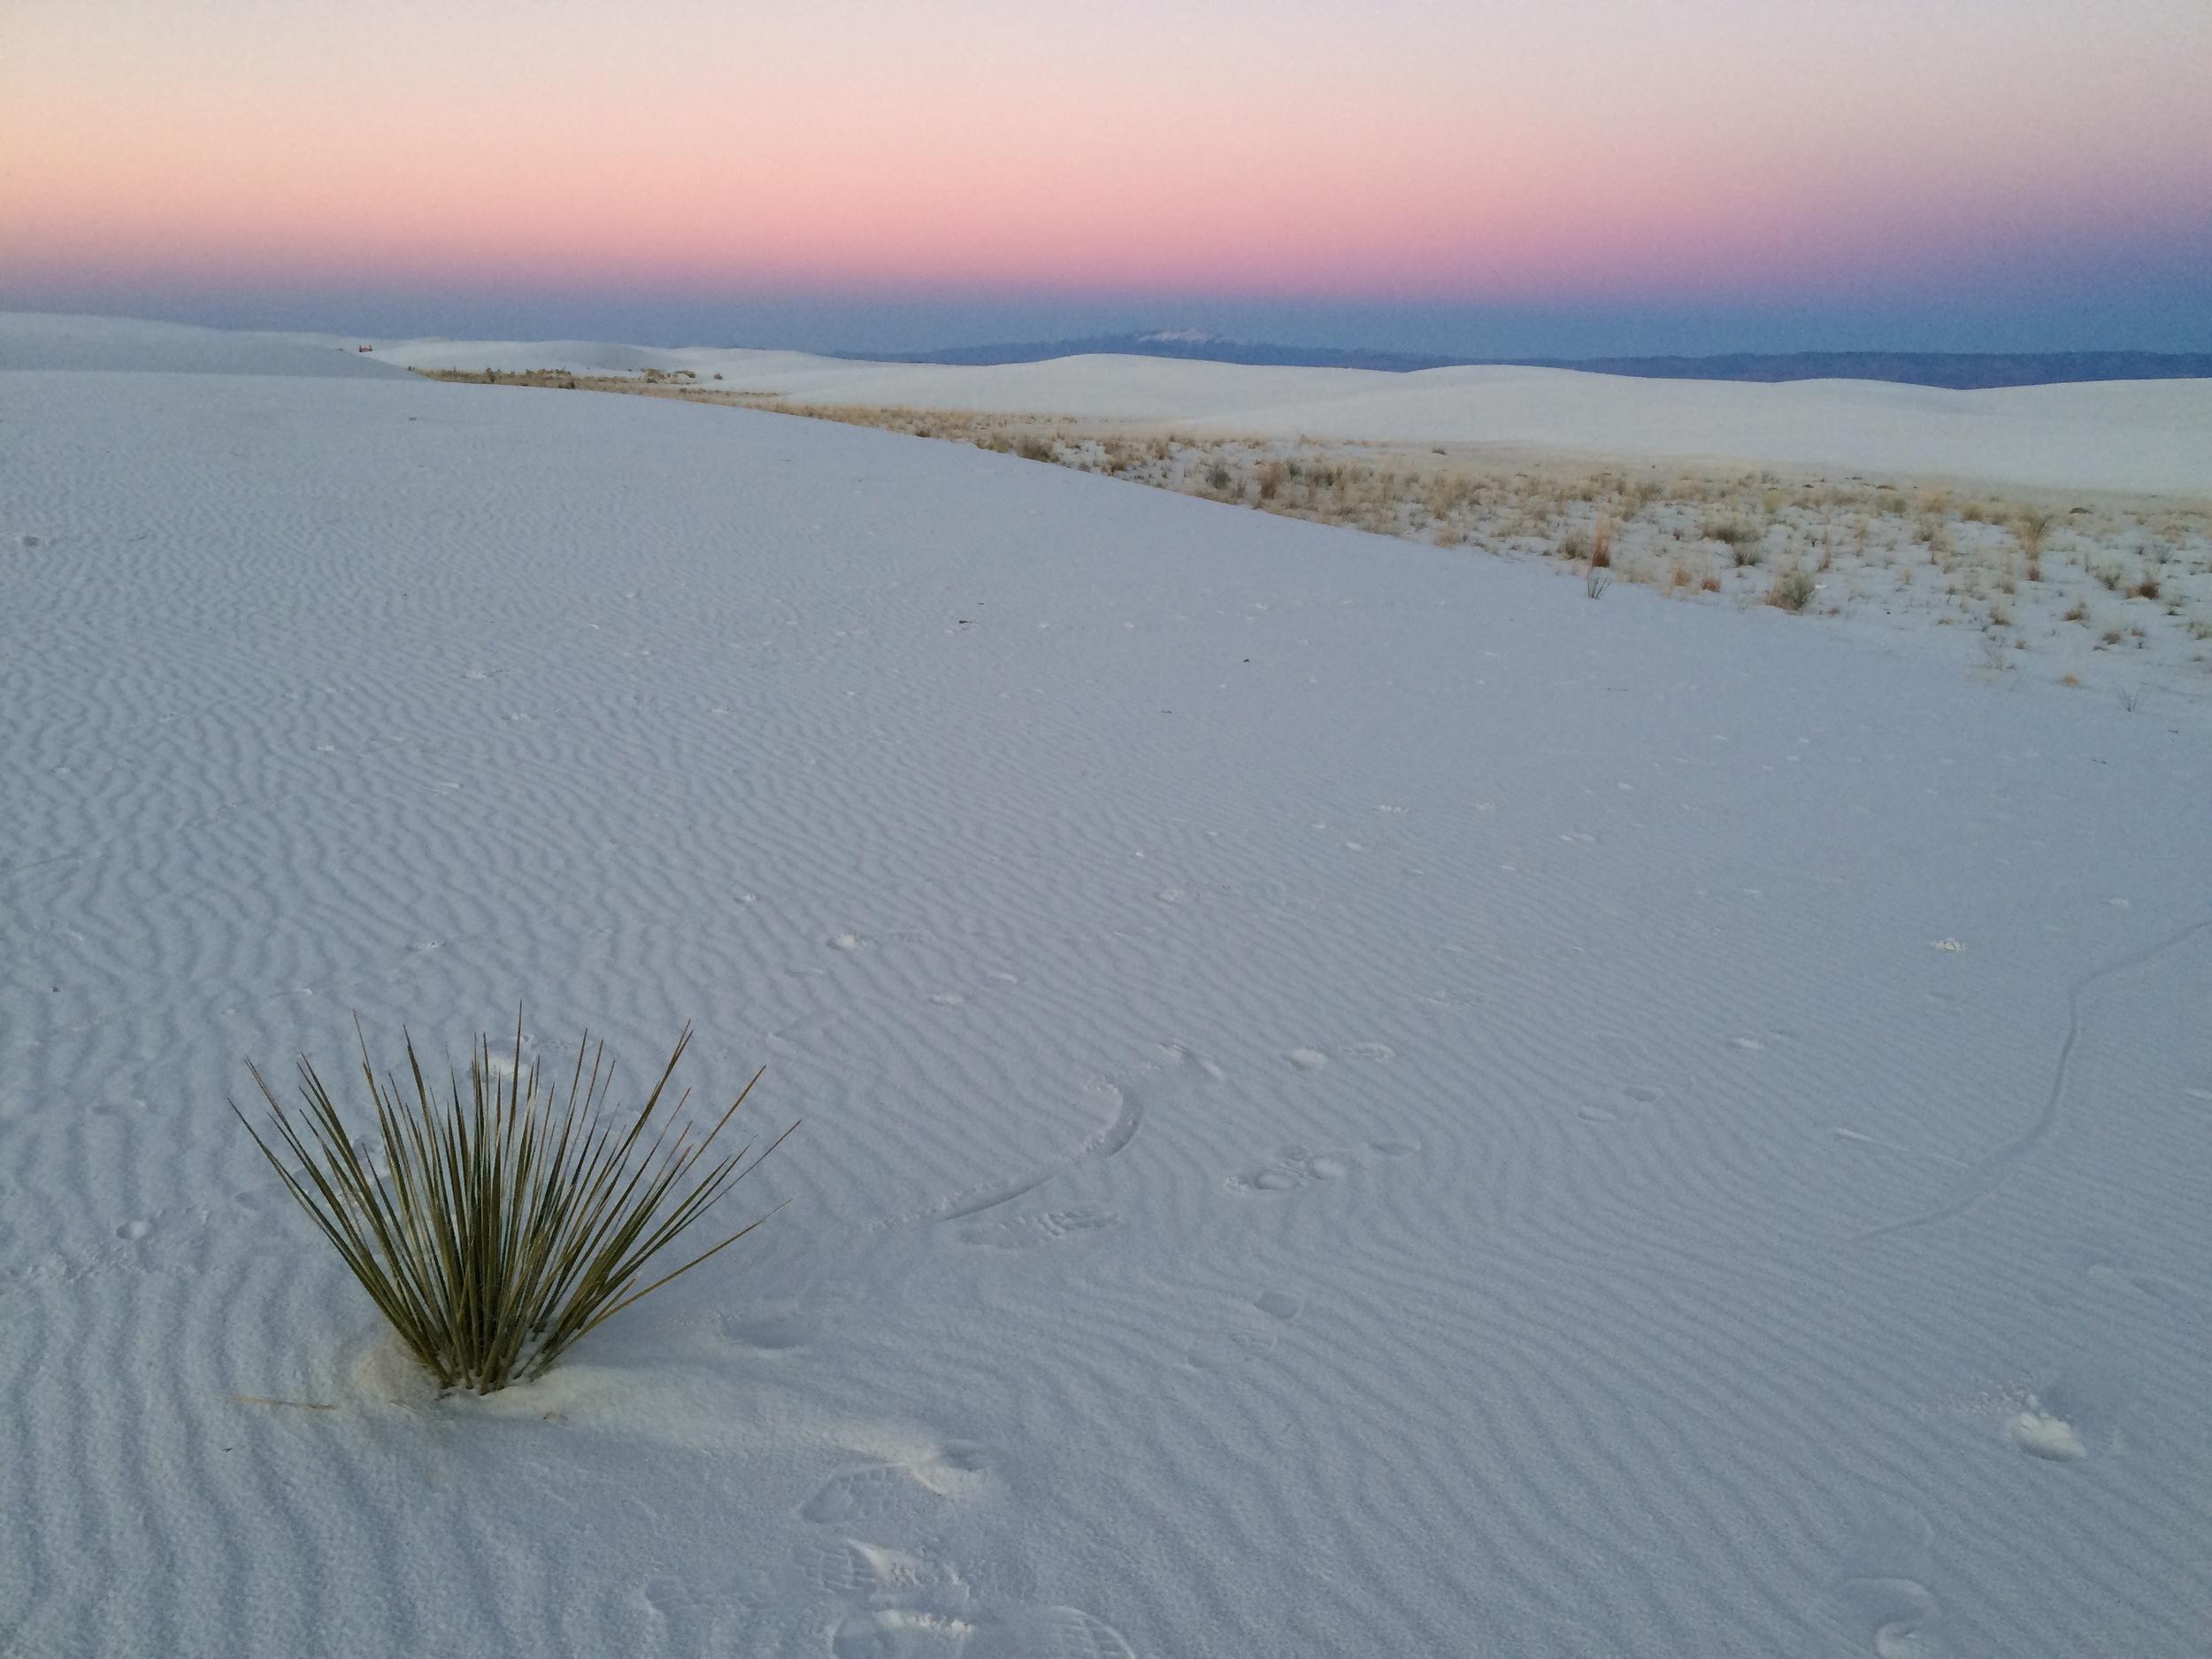 Tularosa, NM - White Sands Desert - photo by Leilani Himmelstein